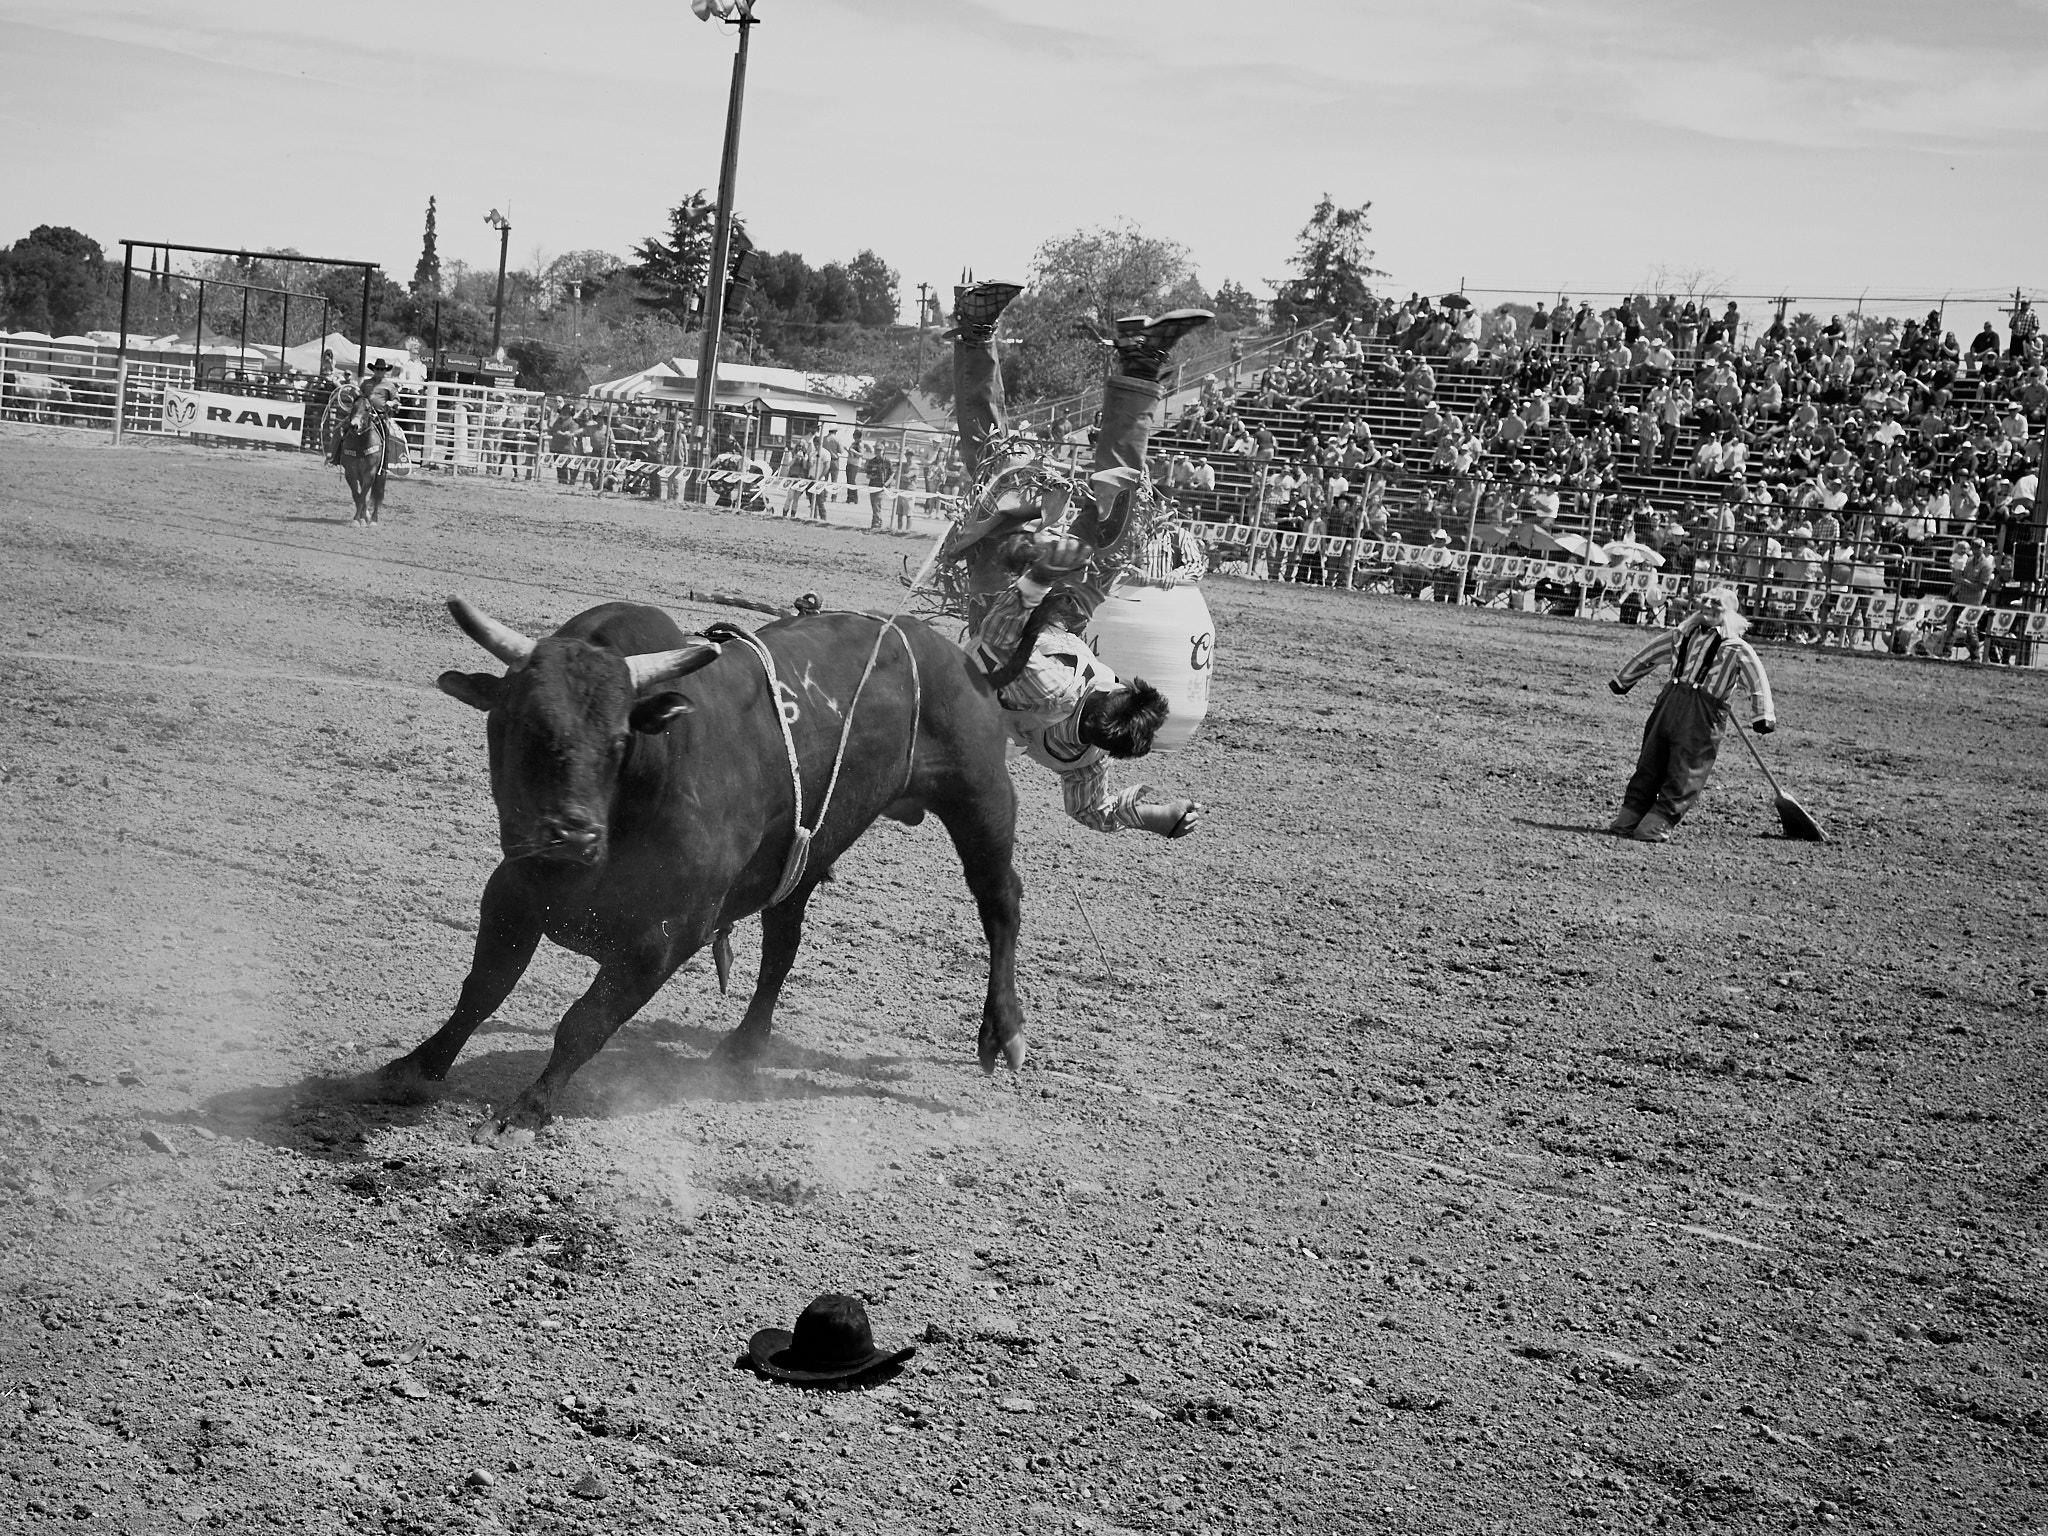 Rodeo_2019_196.jpg